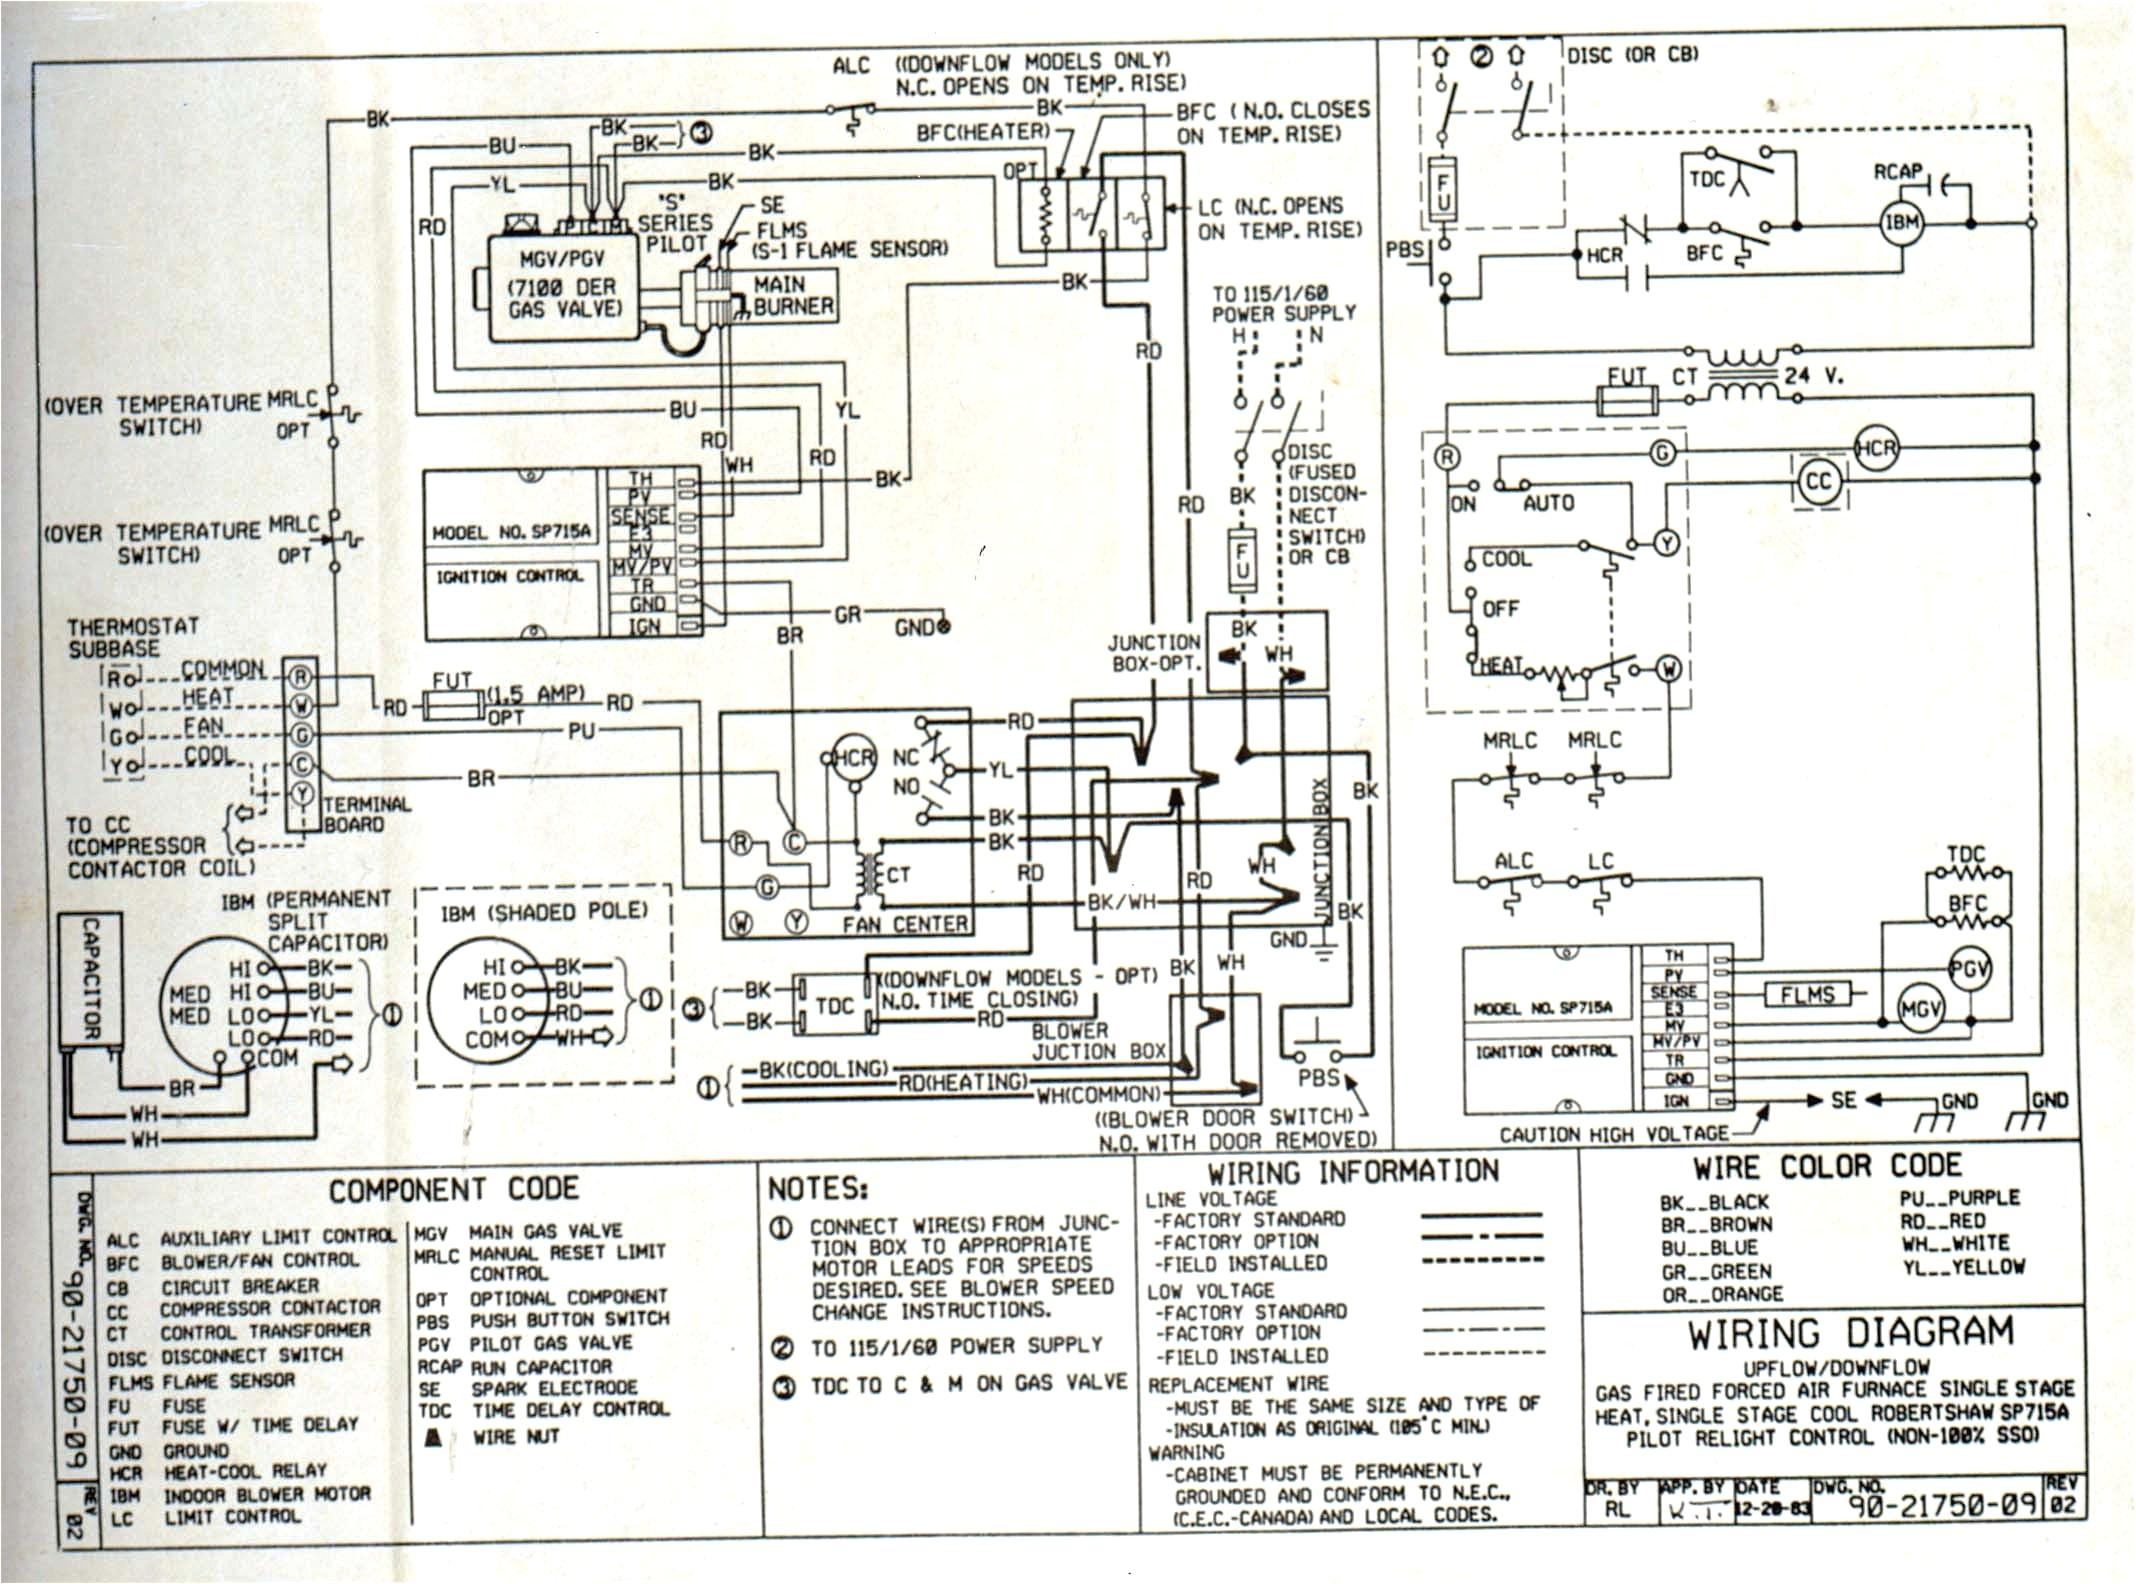 heil electric furnace wiring diagram wiring diagram